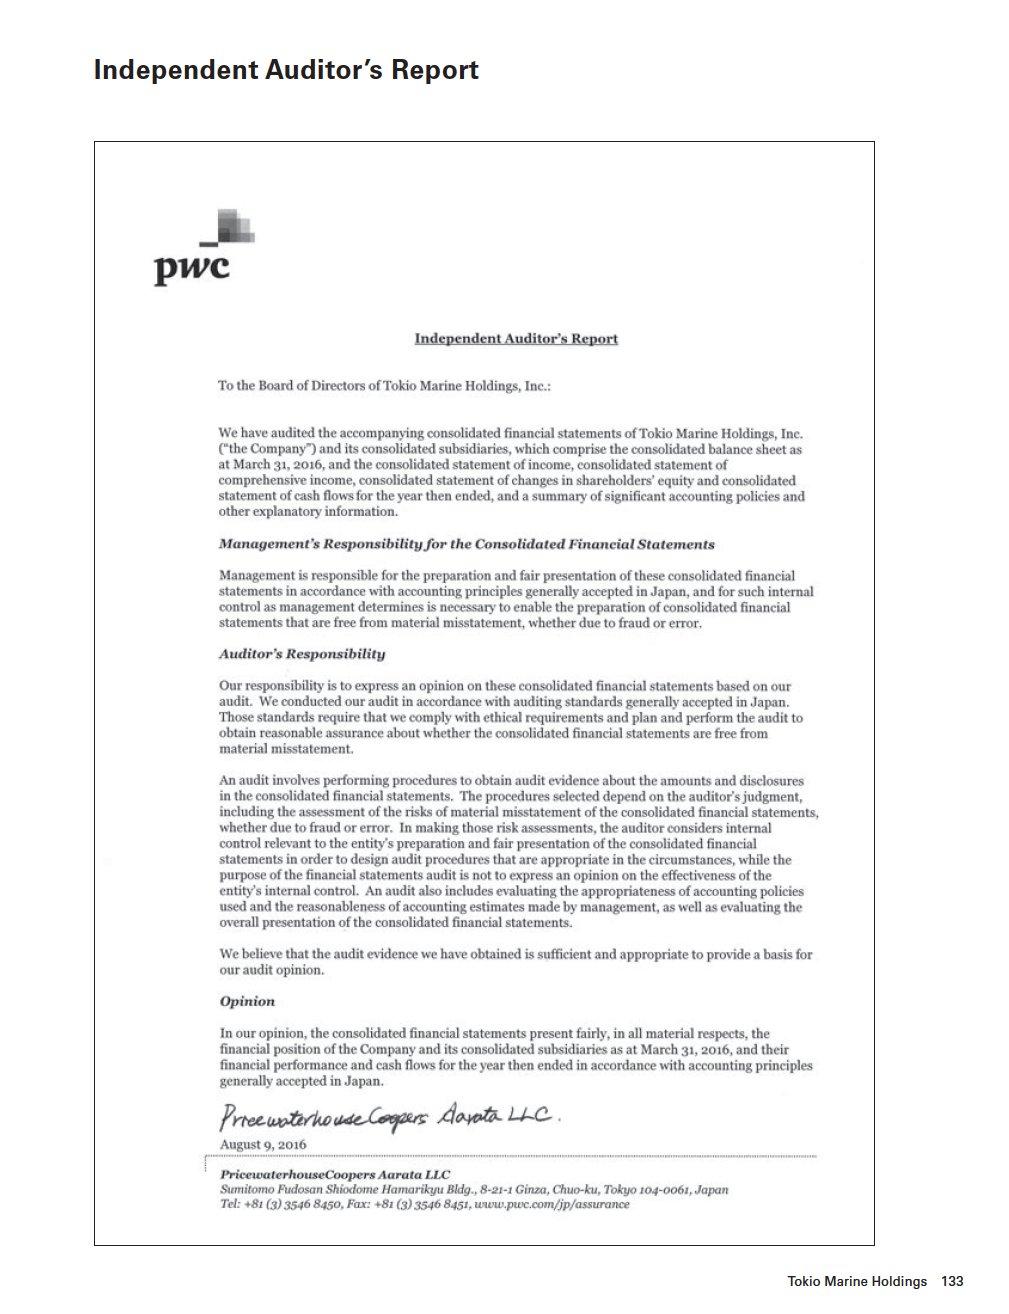 Tokio marine holdings inc independent auditors report altavistaventures Image collections